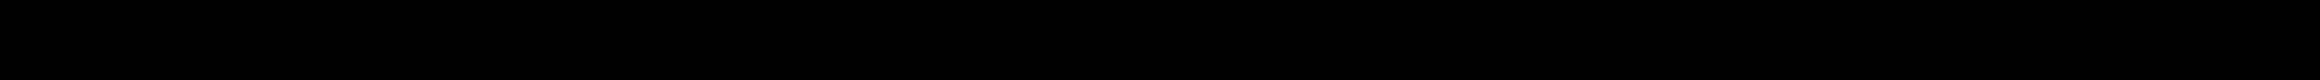 SKF 1T0 498 621, 3C0 498 621, 5K0 498 621, 8J0 498 625 A, 8J0 598 625 Juego de cojinete de rueda